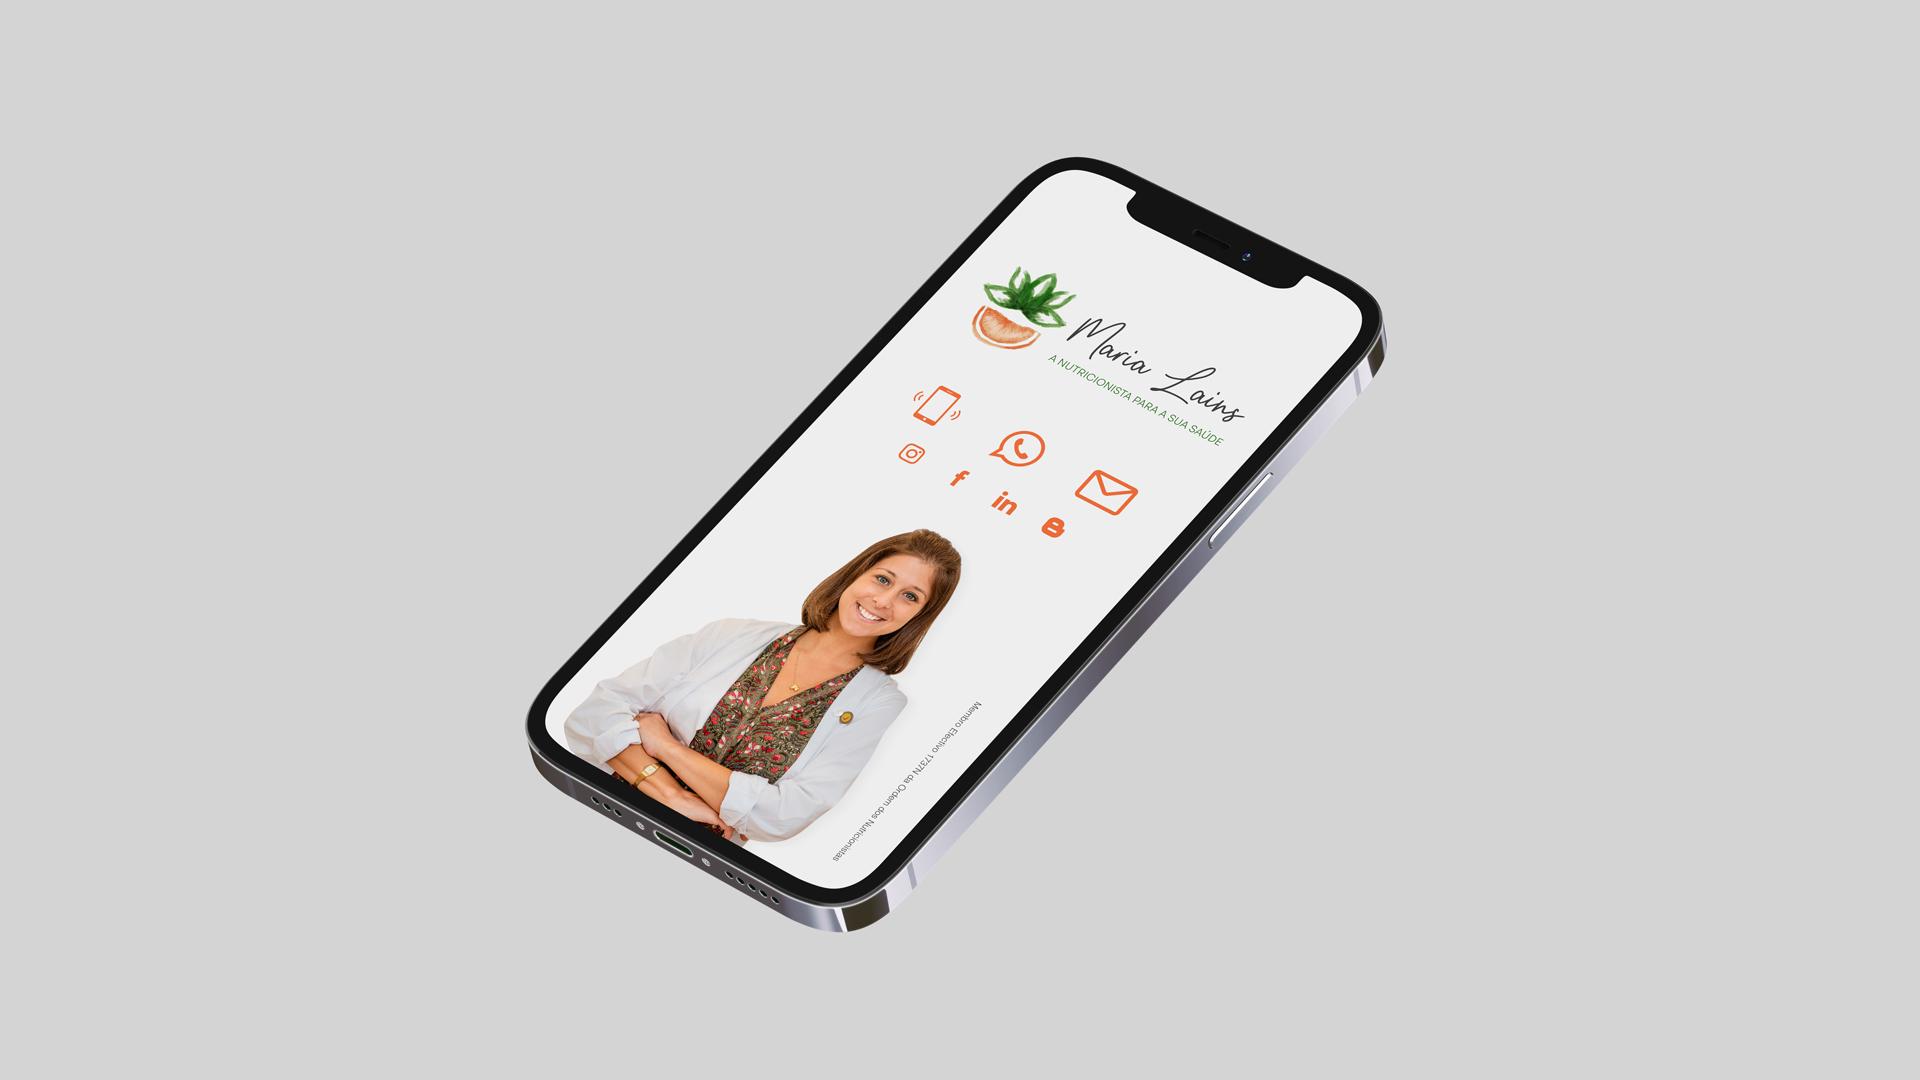 Wellness Brand Design - Digital Business Card for Nutritionist